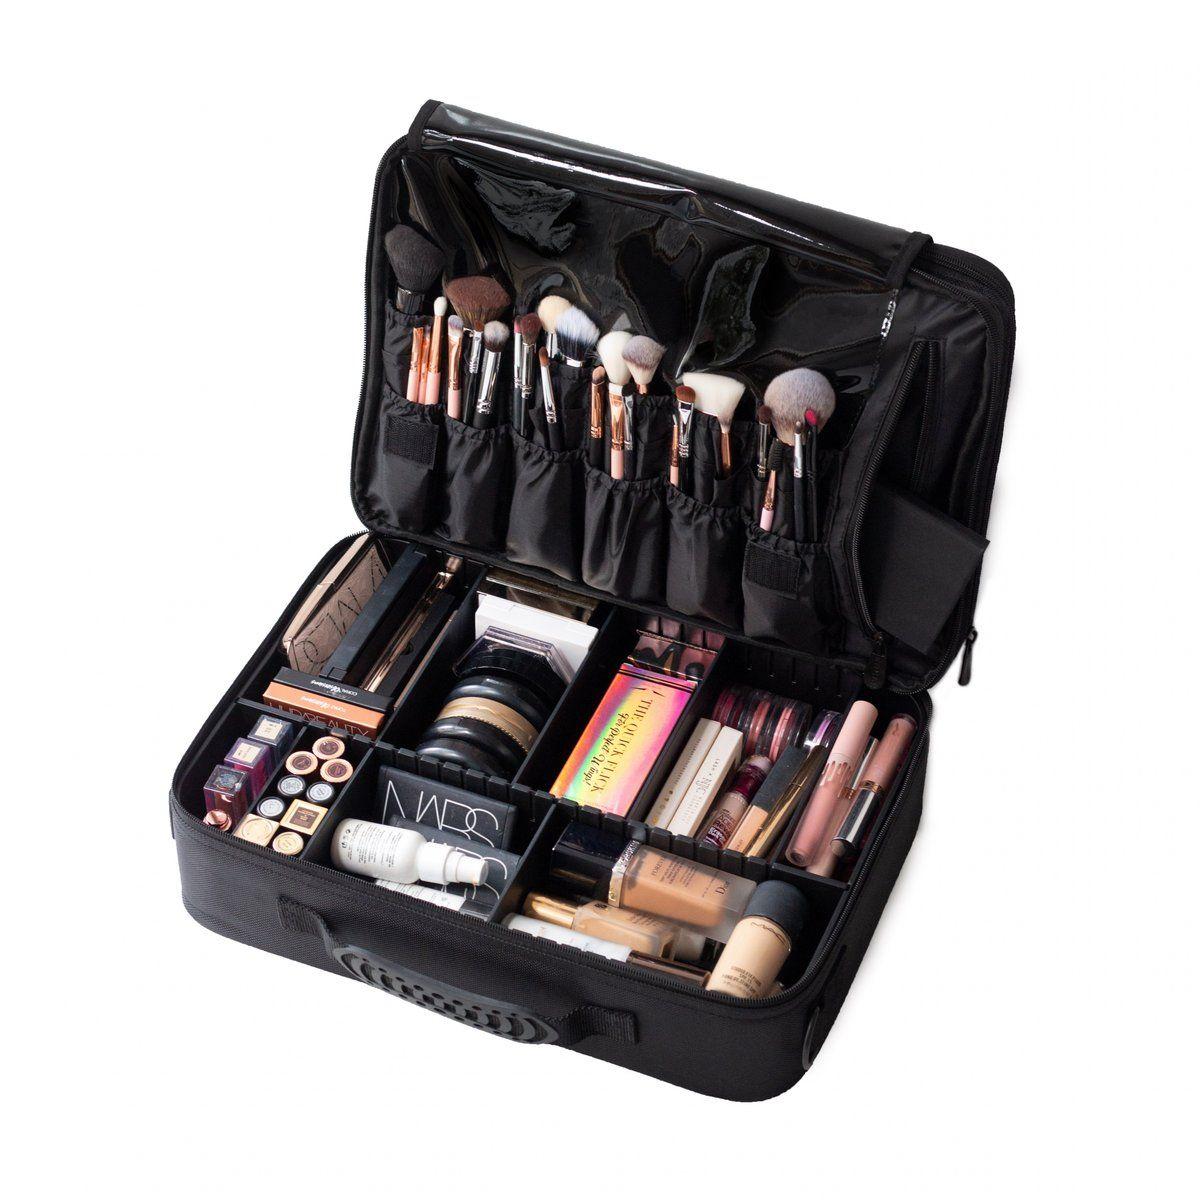 Large Cosmetic Travel Case Black Acrylic makeup storage